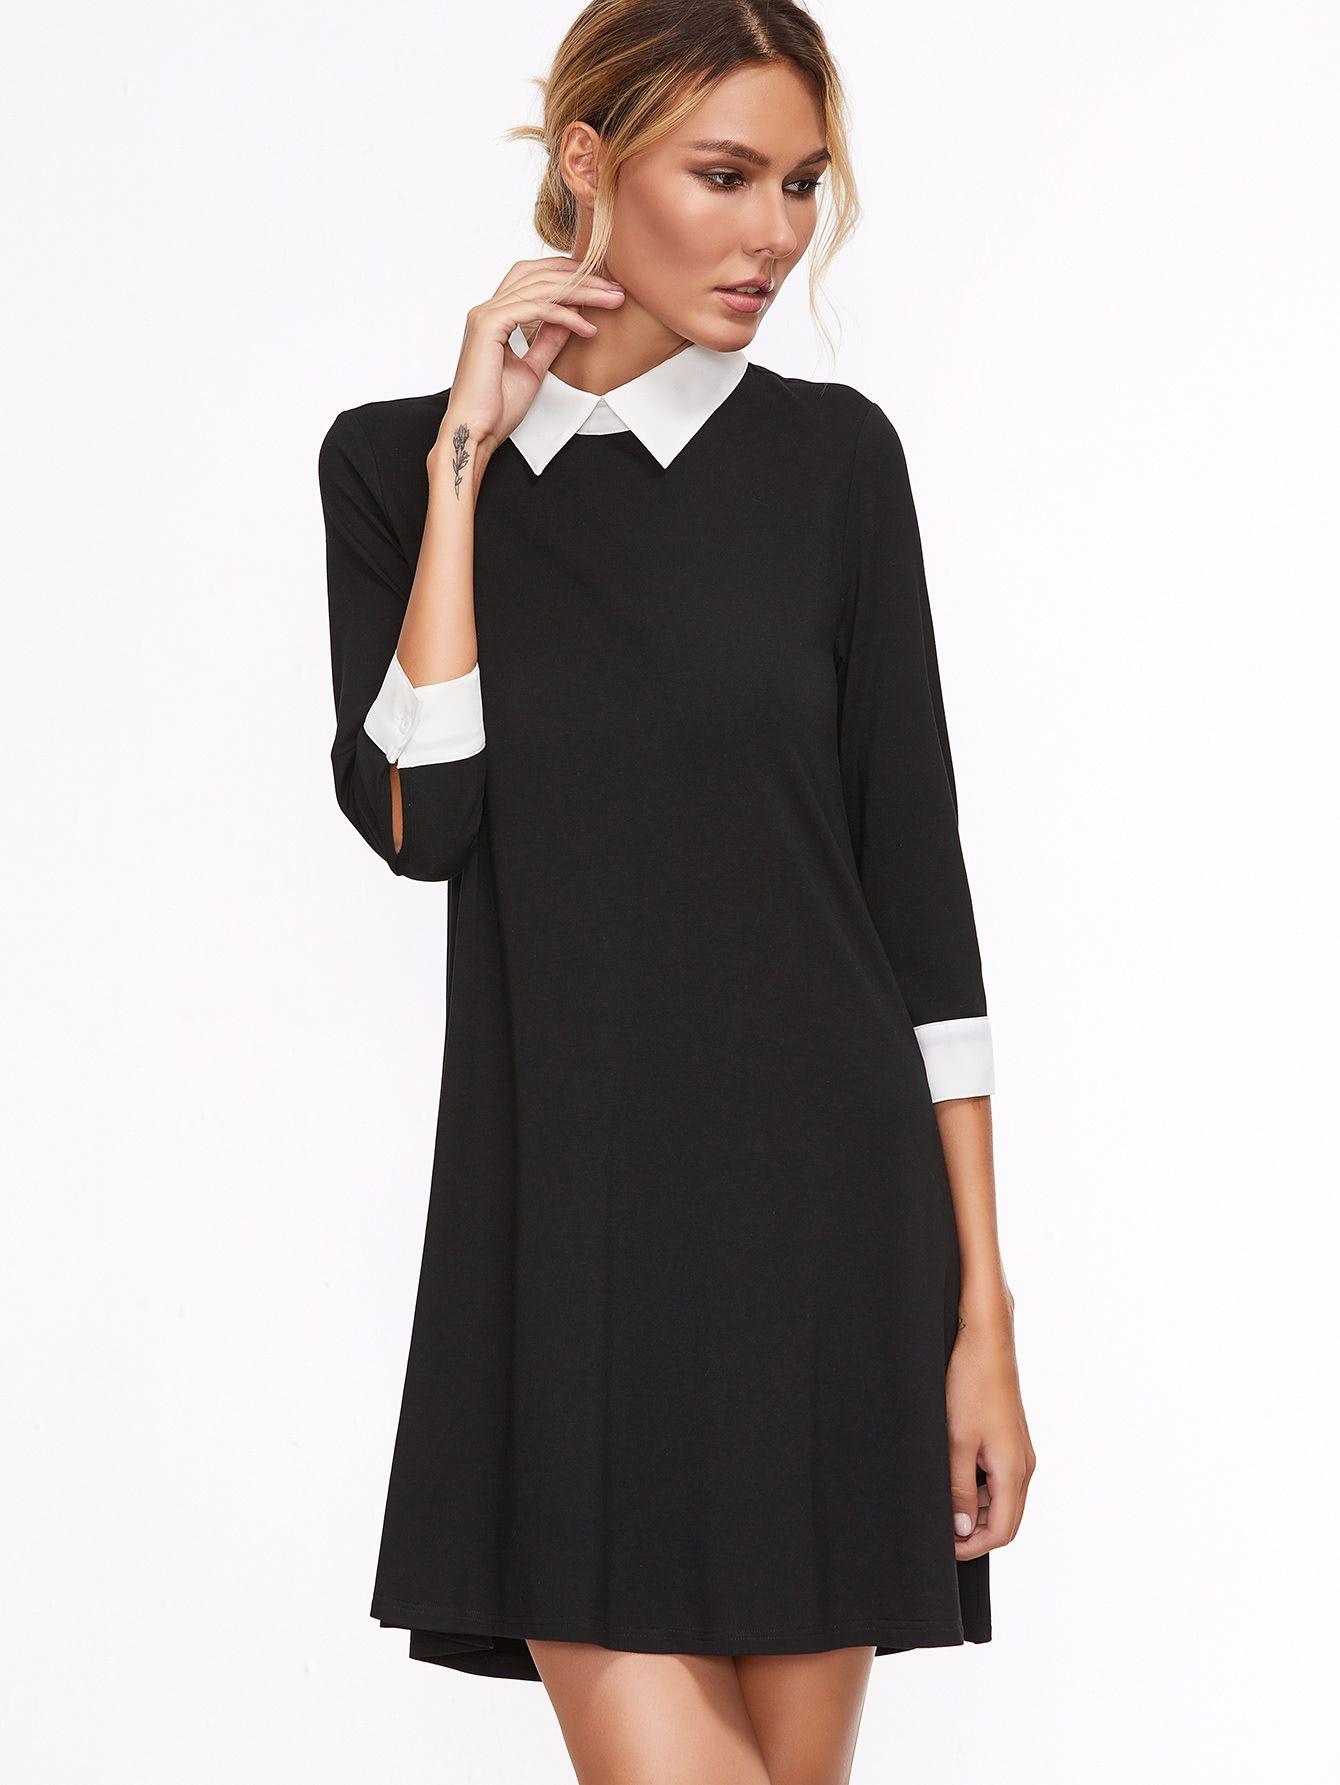 Contrast Collar And Cuff Swing Dress Contrast Collar Dress Short Dress Black Dresses [ 1785 x 1340 Pixel ]